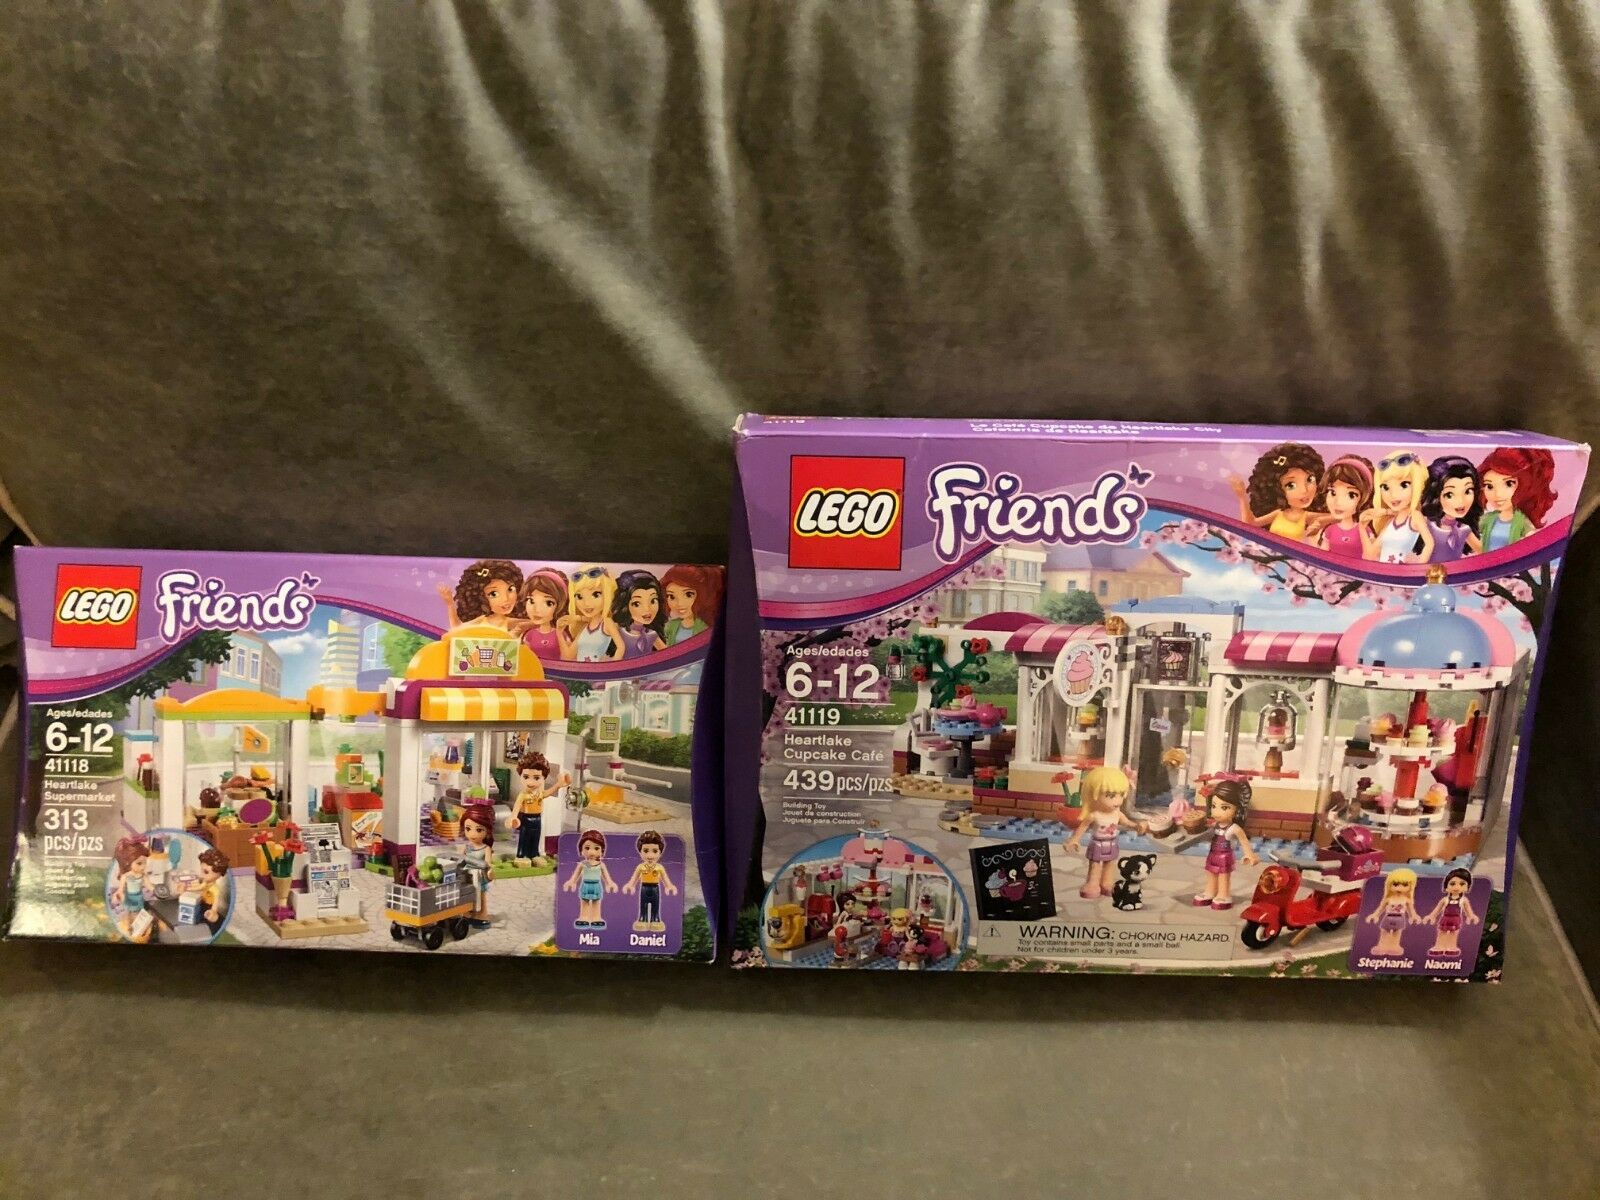 Lego Friends Heartlake 41118 Supermarket, 41119 Cupcake Cafe - NISB - RetiROT